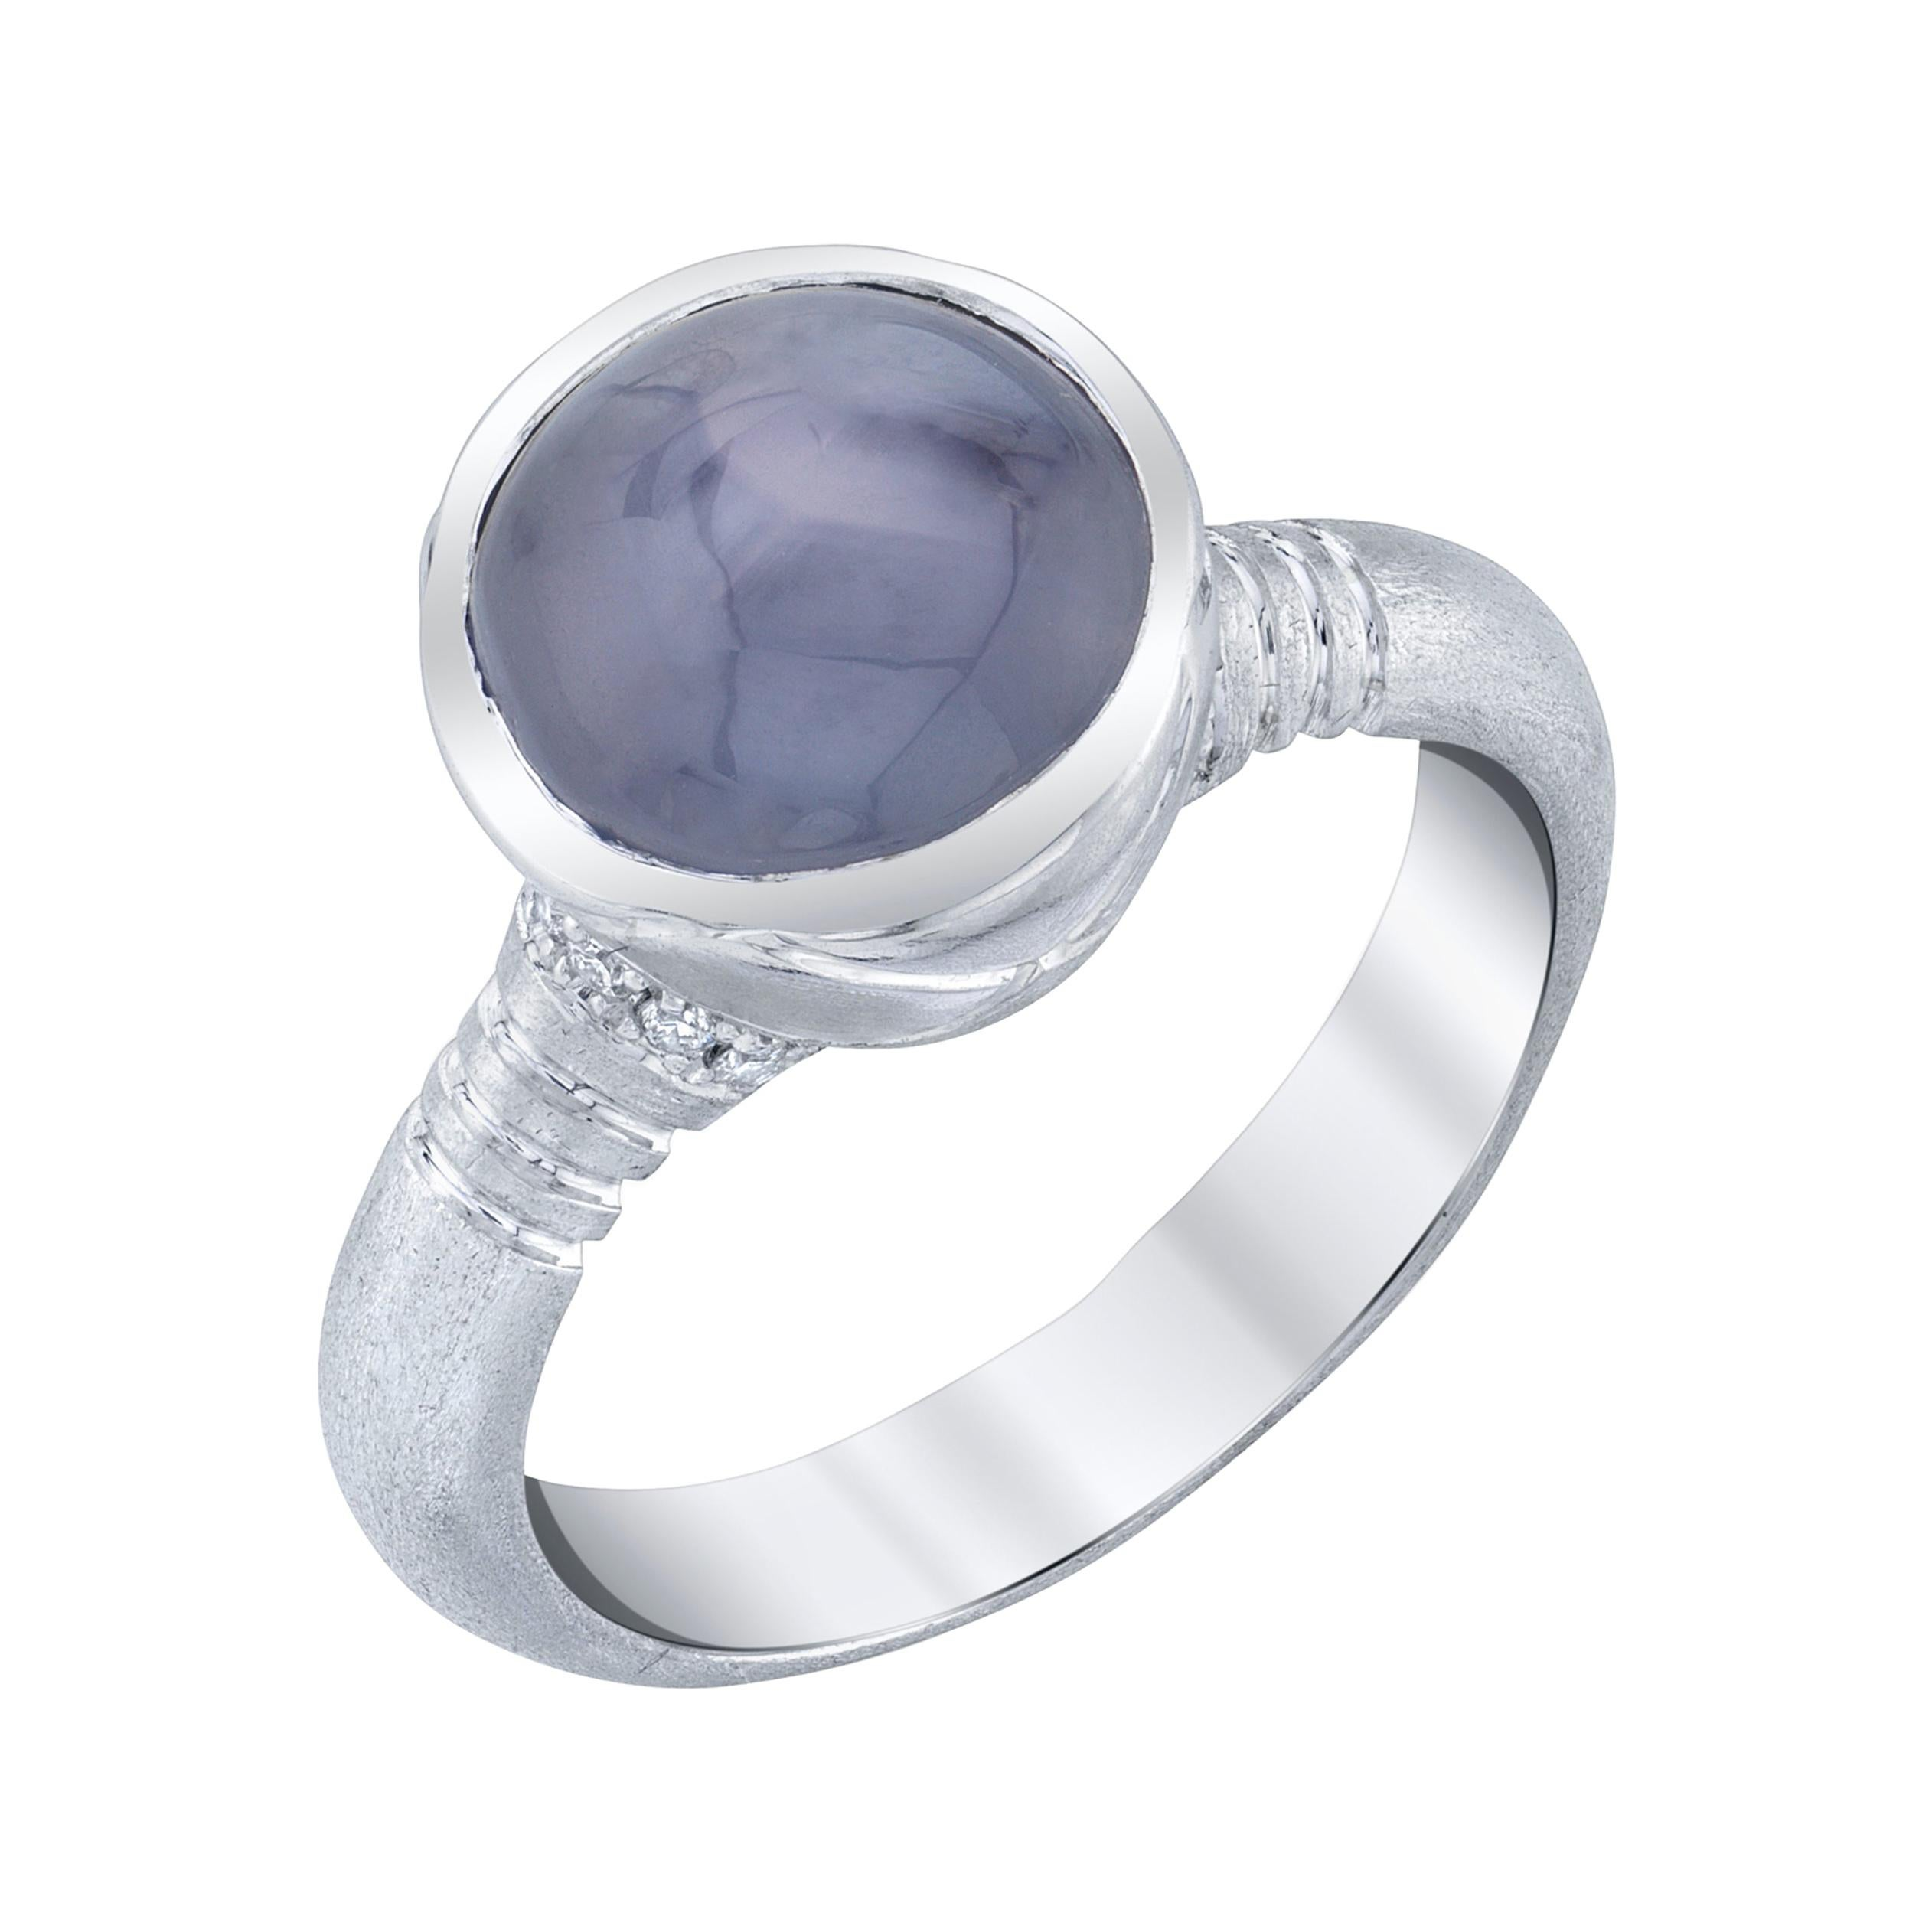 6.36 Carat Oval Silver Blue Star Sapphire Cabochon, Diamond, White Gold Ring